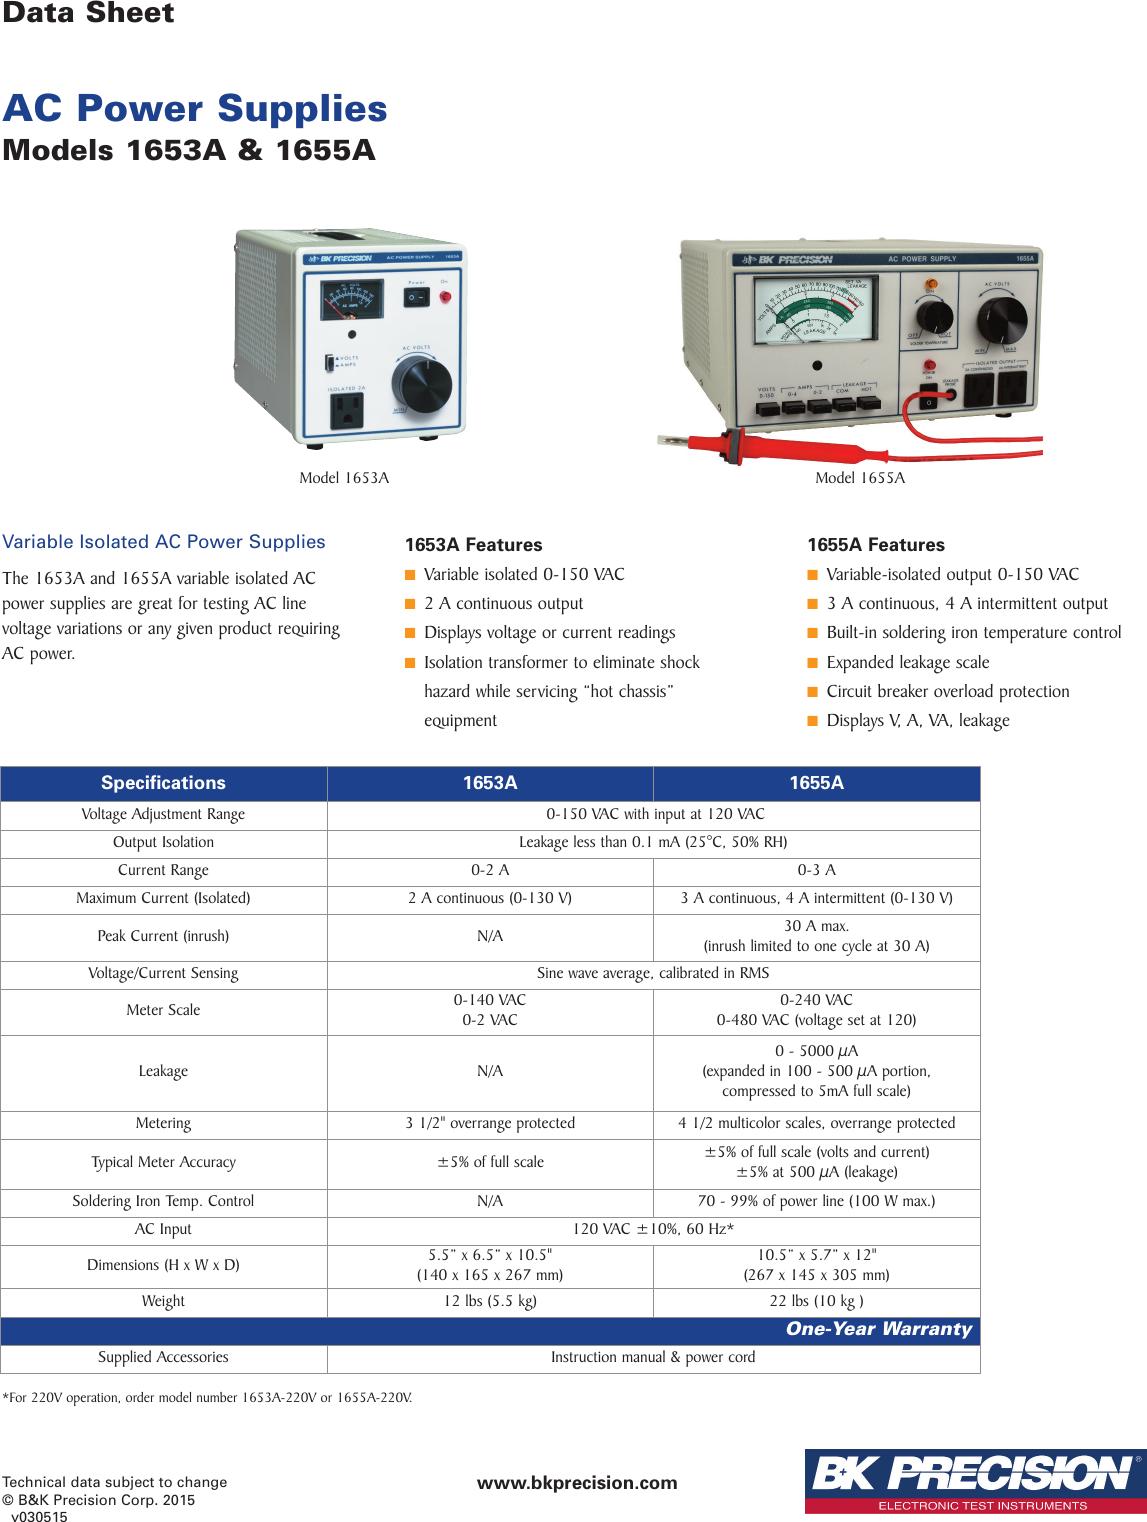 1653A And 1655A AC Power Supplies 16xx A Datasheet